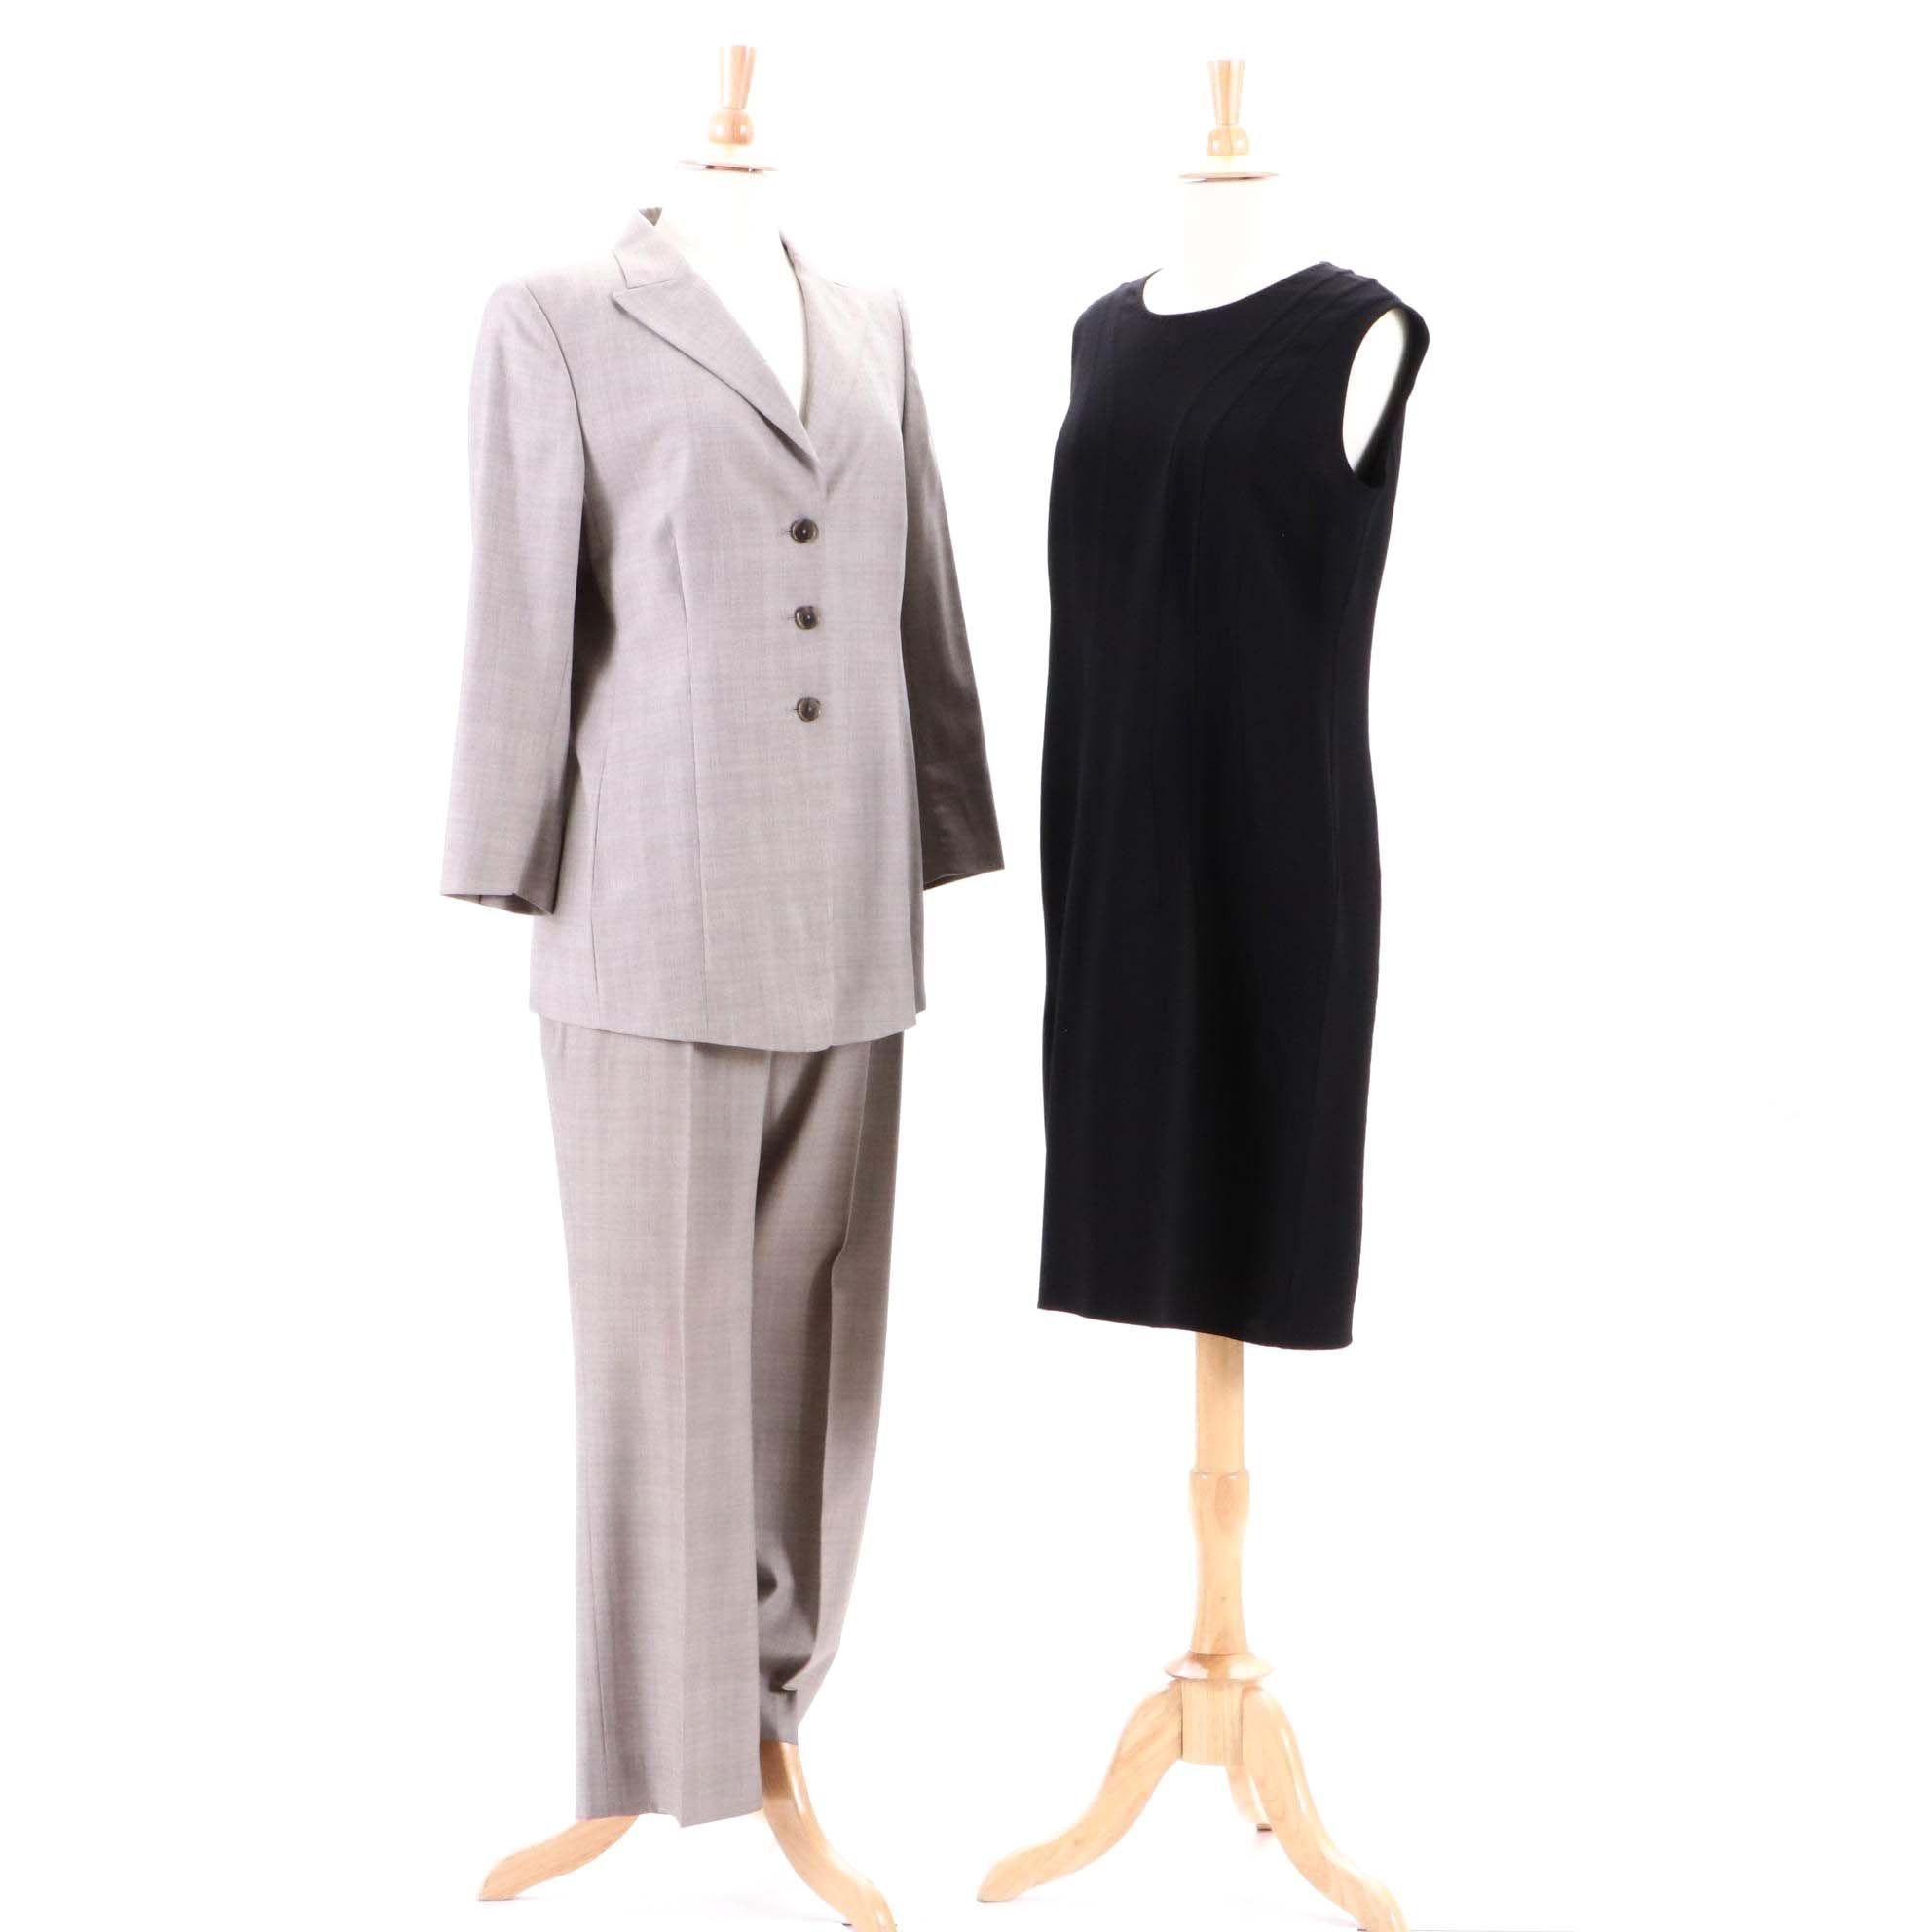 Agnona Wool Blend Sleeveless Black Dress and AKRIS Bergdorf Goodman Pantsuit